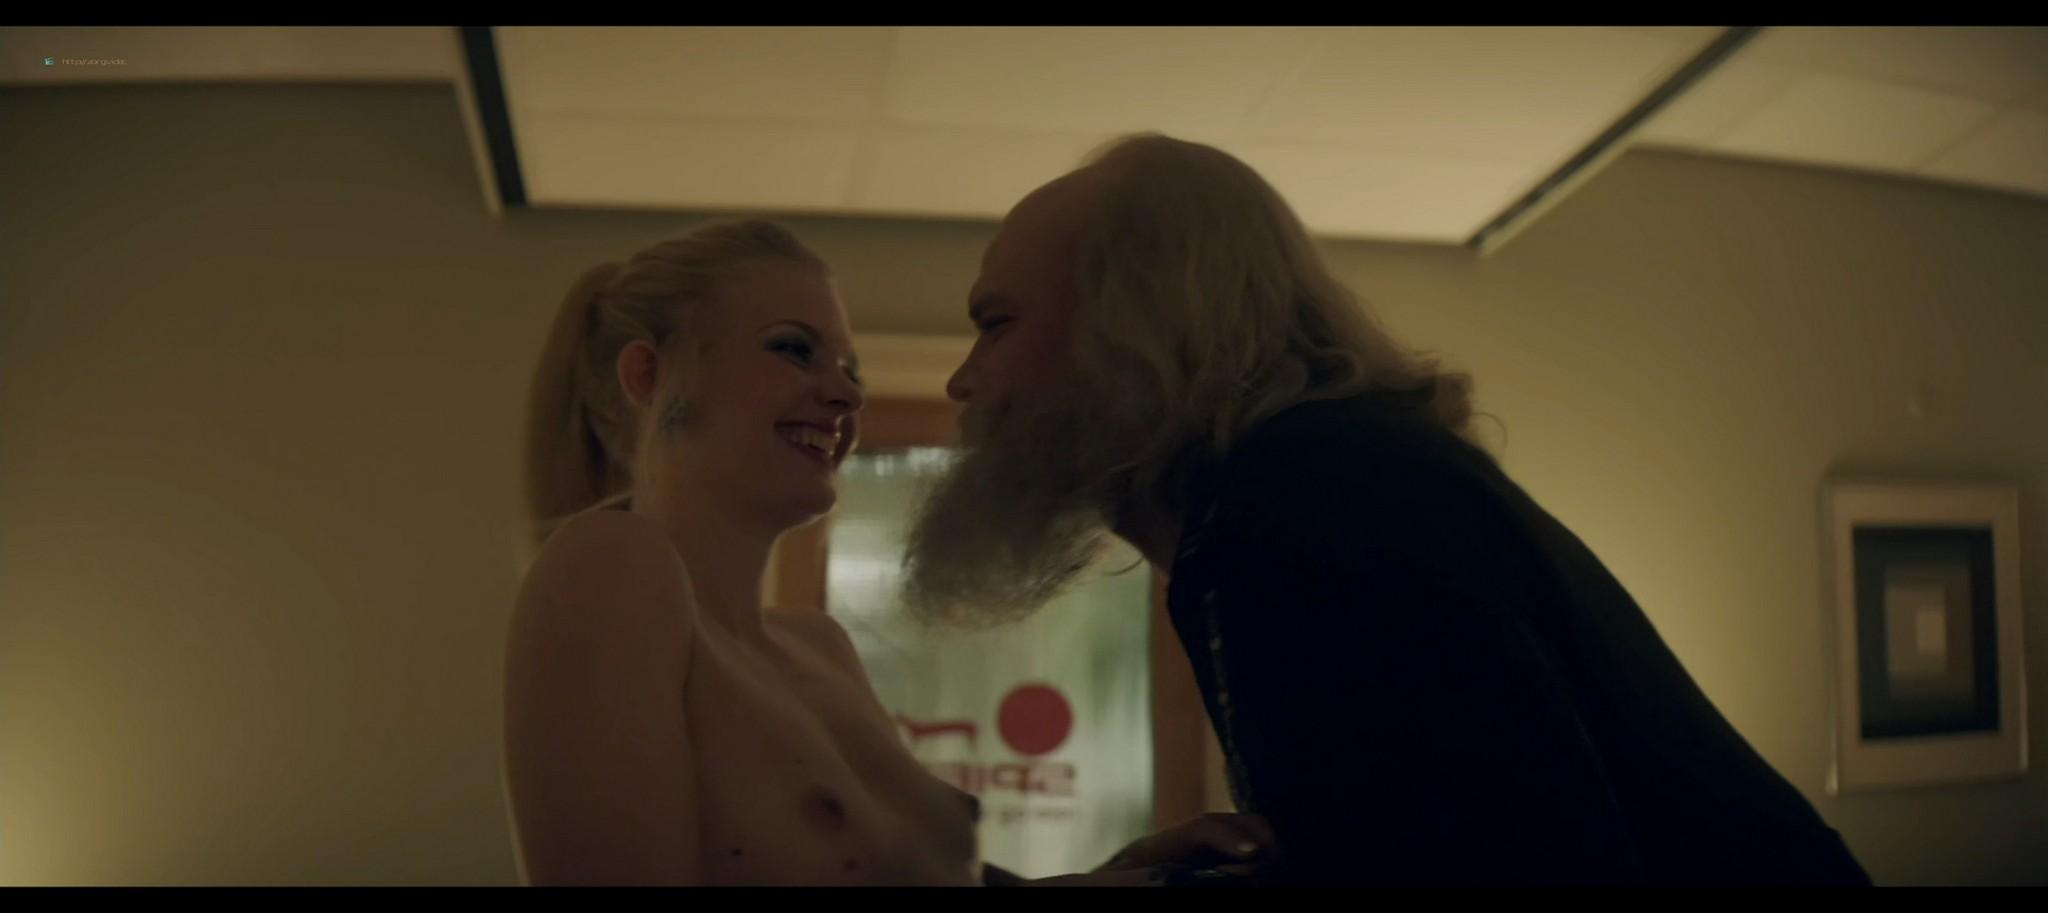 Camilla Cornelia Lehmann nude Sarahsita Lassen, nude and explicit body parts - Spies Og Glistrup (DK-2013) HD 1080p BluRay (7)